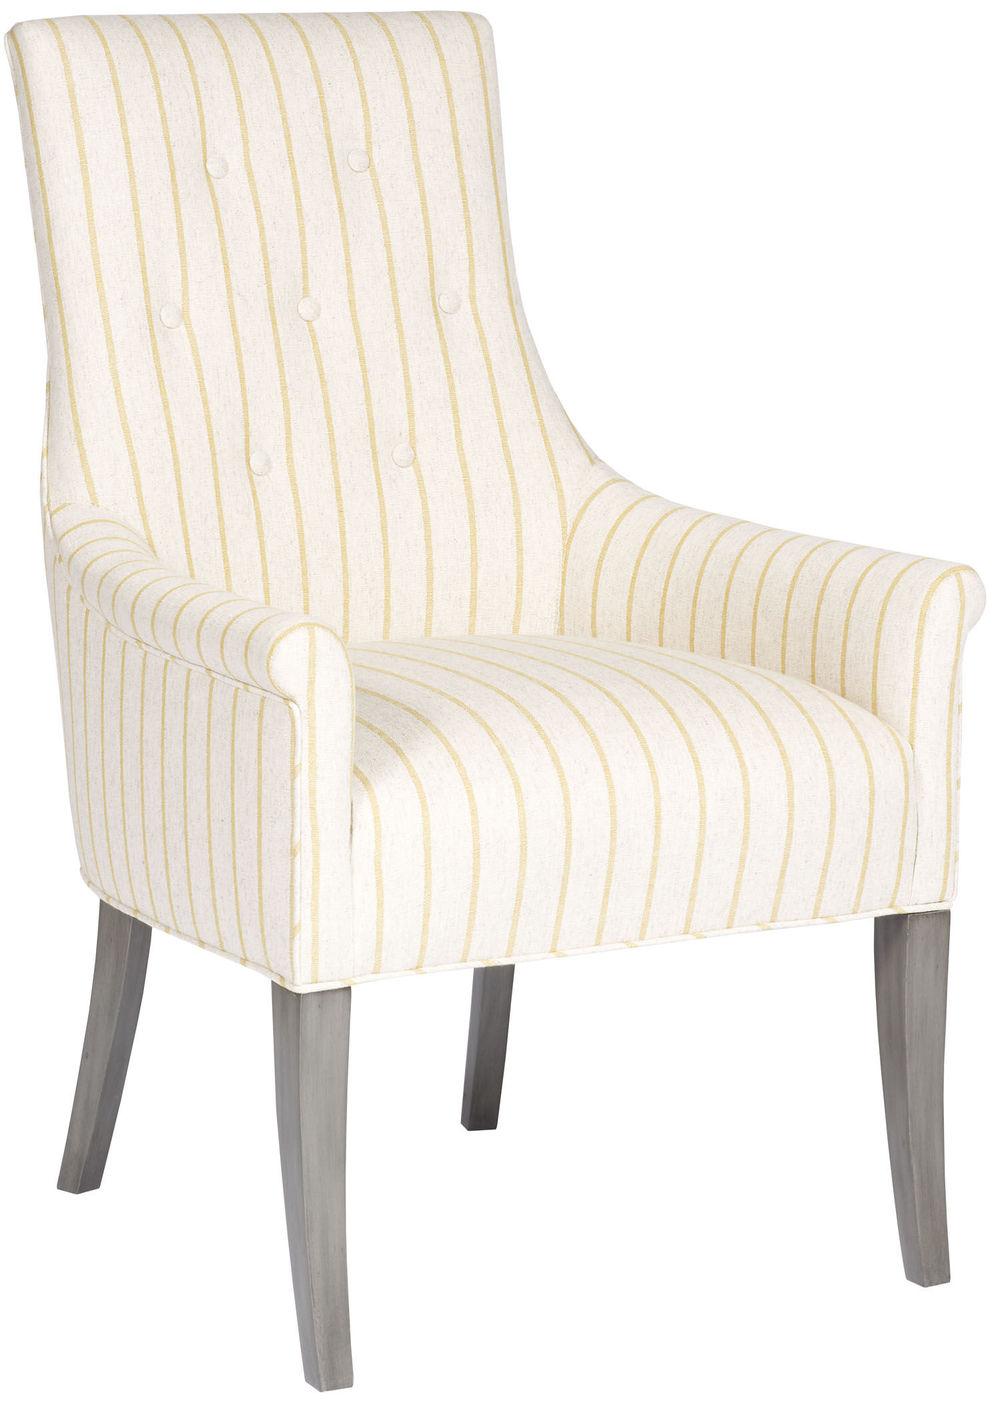 Vanguard Furniture - Nevils Dining Arm Chair